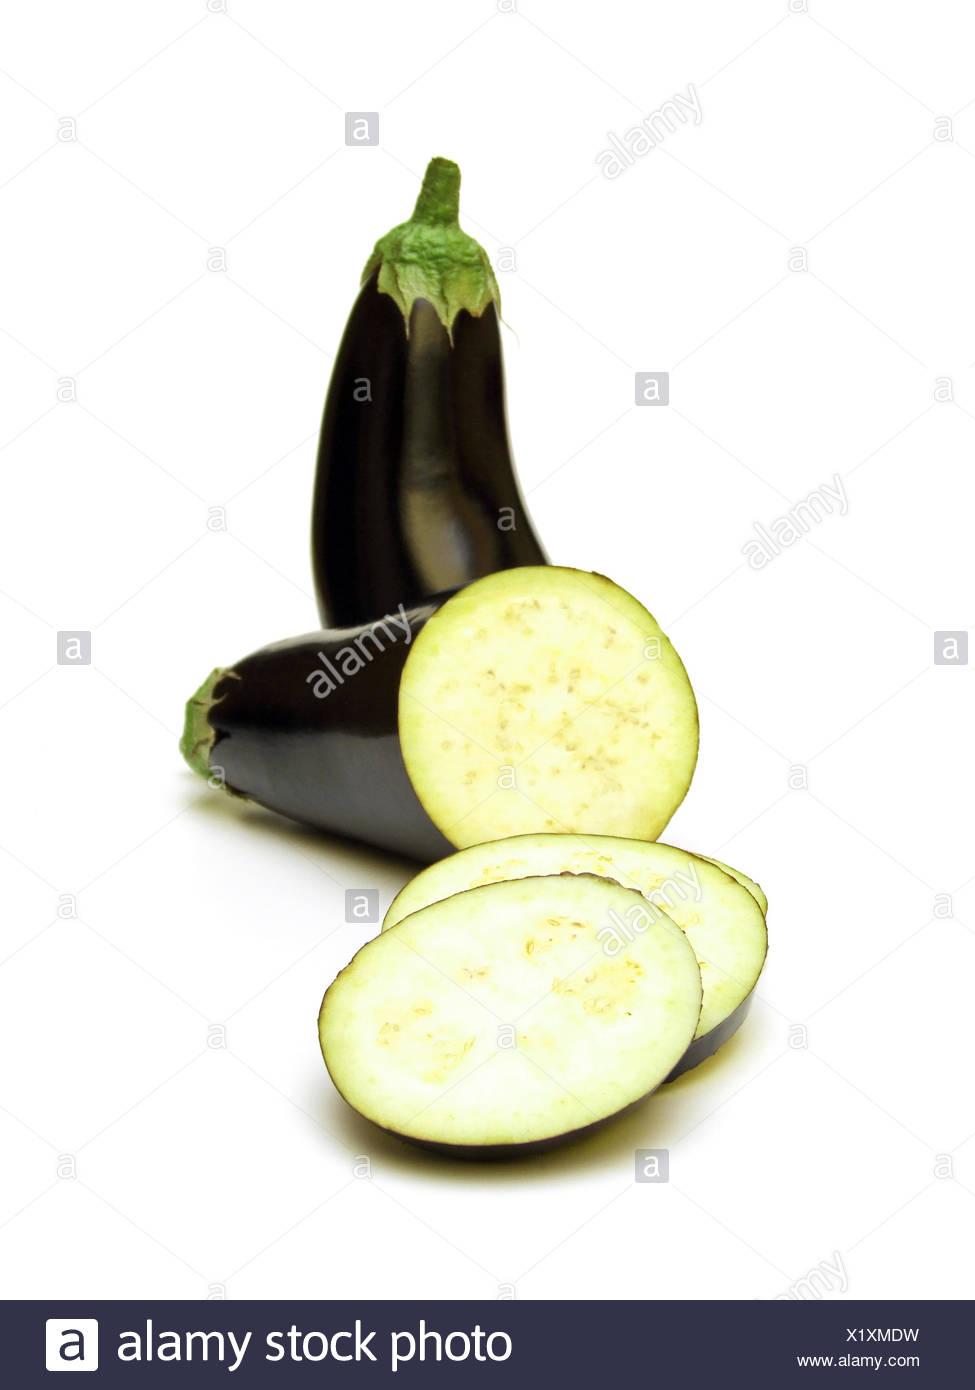 eggplant (Solanum melongena) - Stock Image